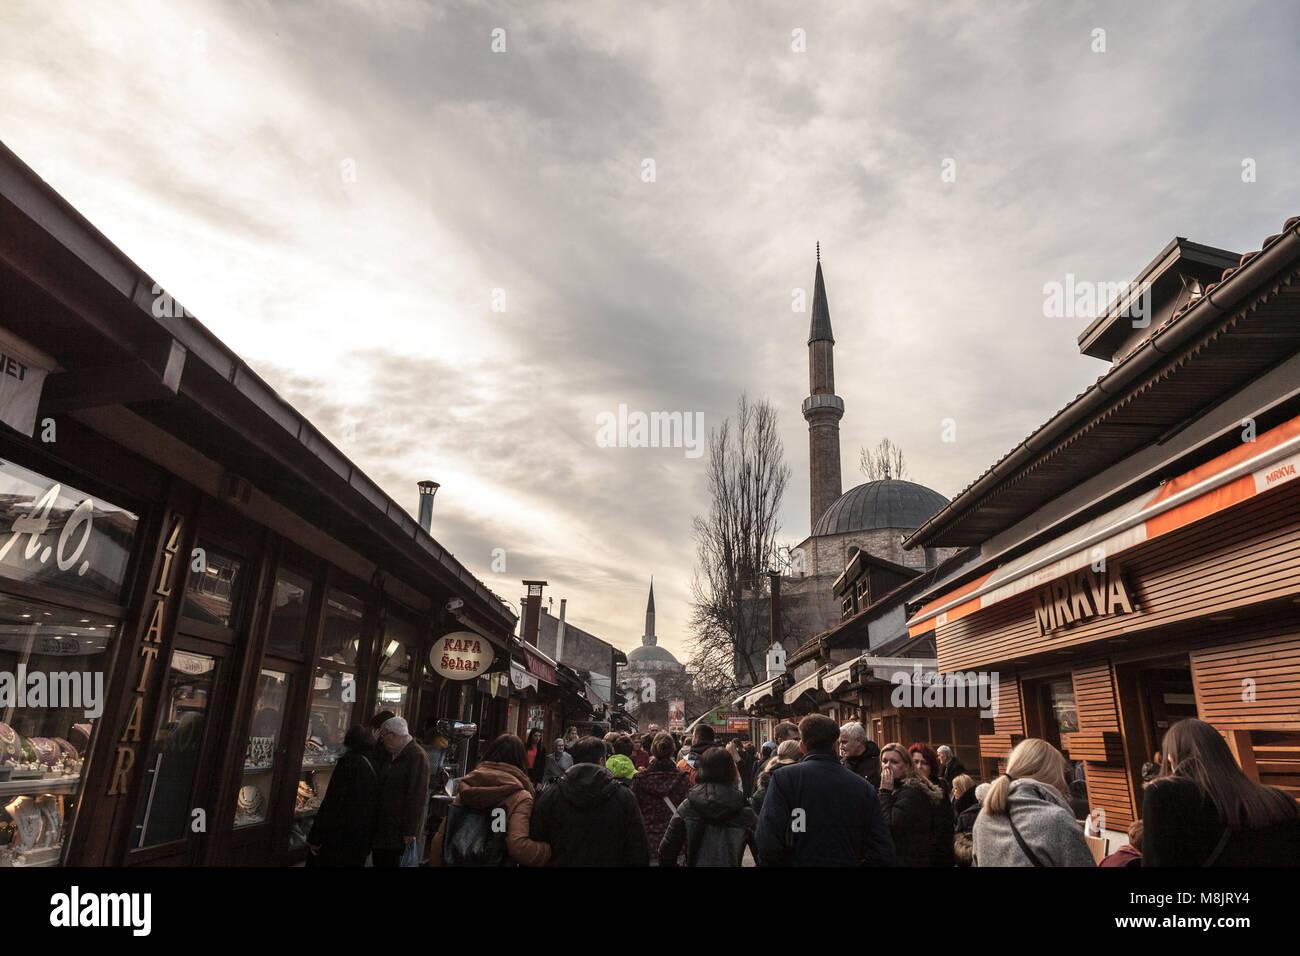 SARAJEVO, BOSNIA AND HERZEGOVINA - FEBRUARY 17, 2018: Street crowded with tourists and a Mosque Minaret in the Bascarsija - Stock Image